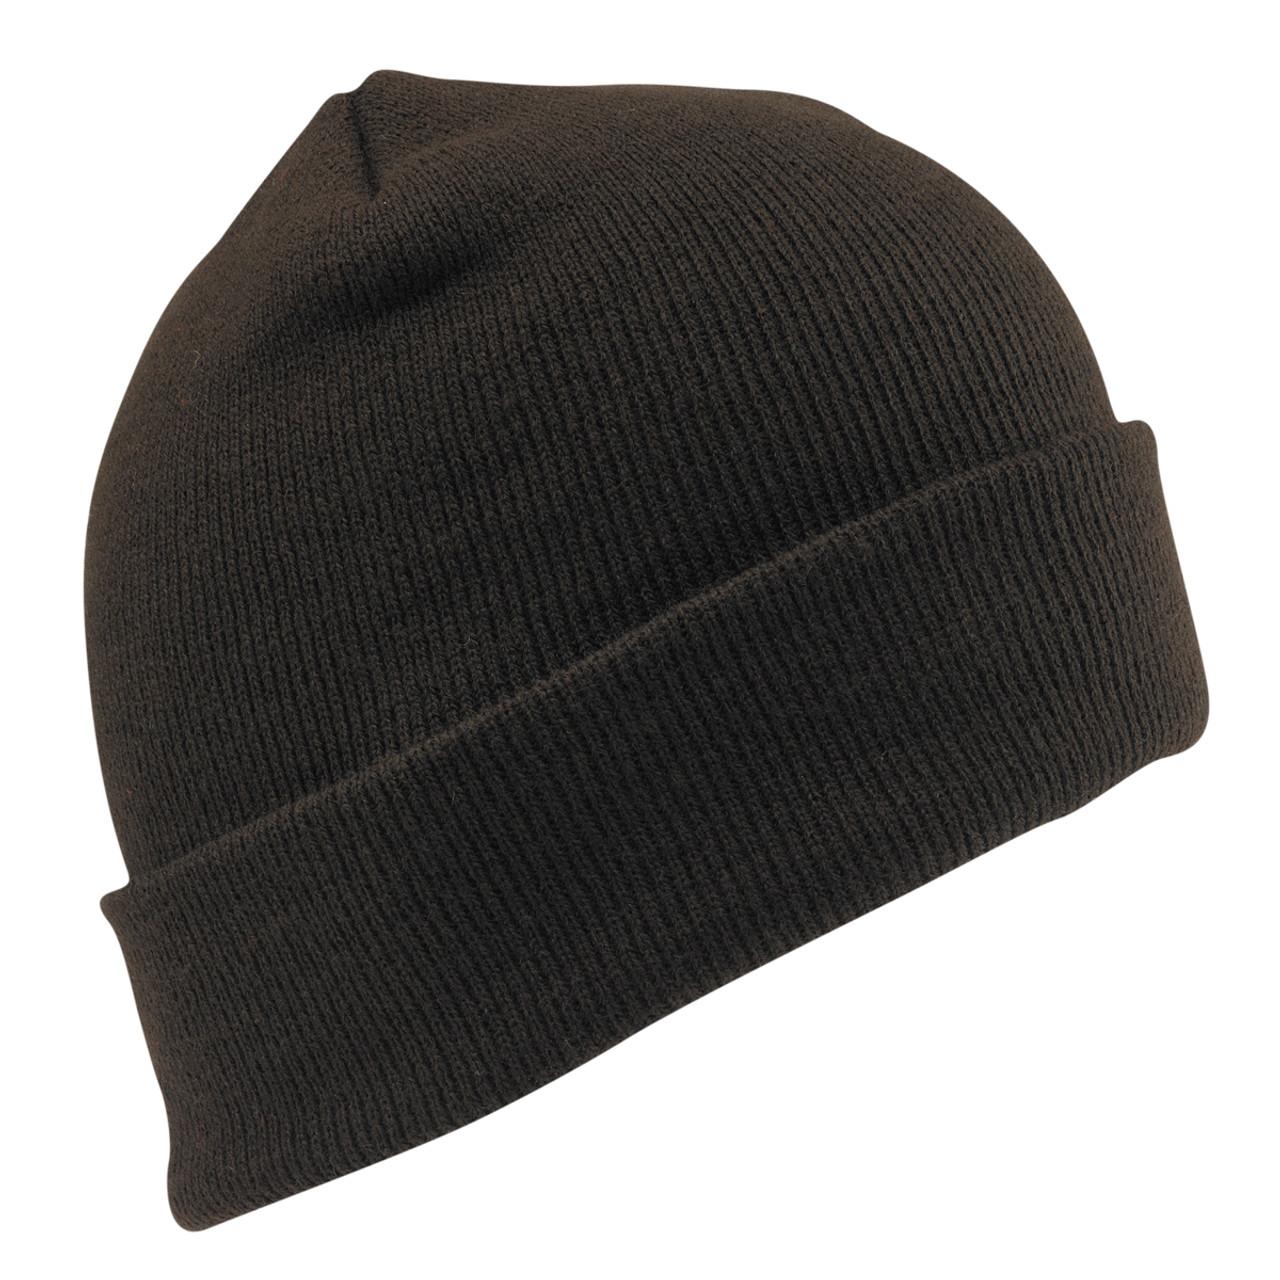 684f95673c6 Wigwam 1017 Knit Hat